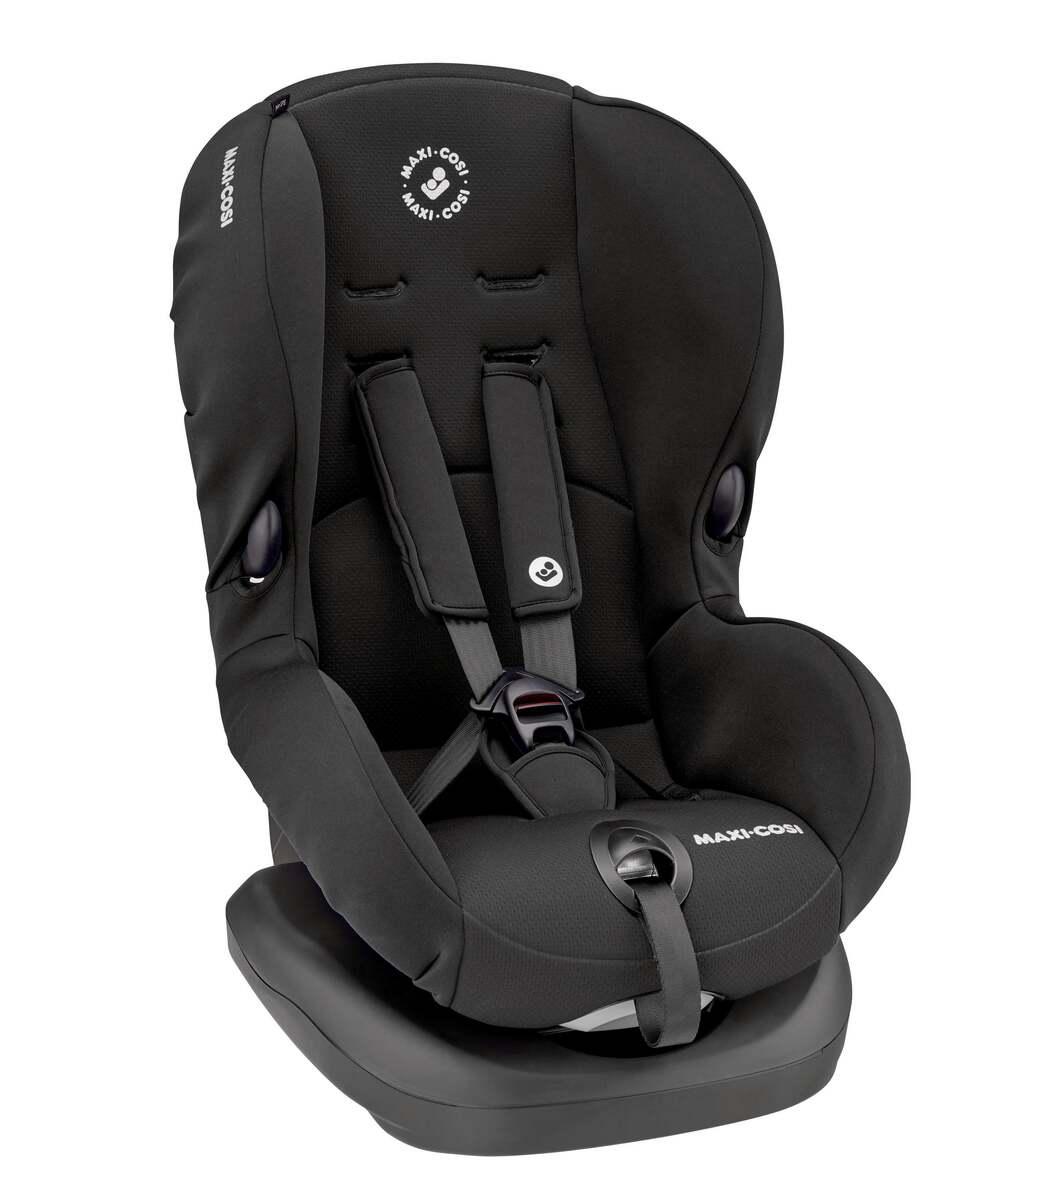 "Bild 2 von Maxi-Cosi Auto-Kindersitz ""Priori SPS+"", Basic Black"